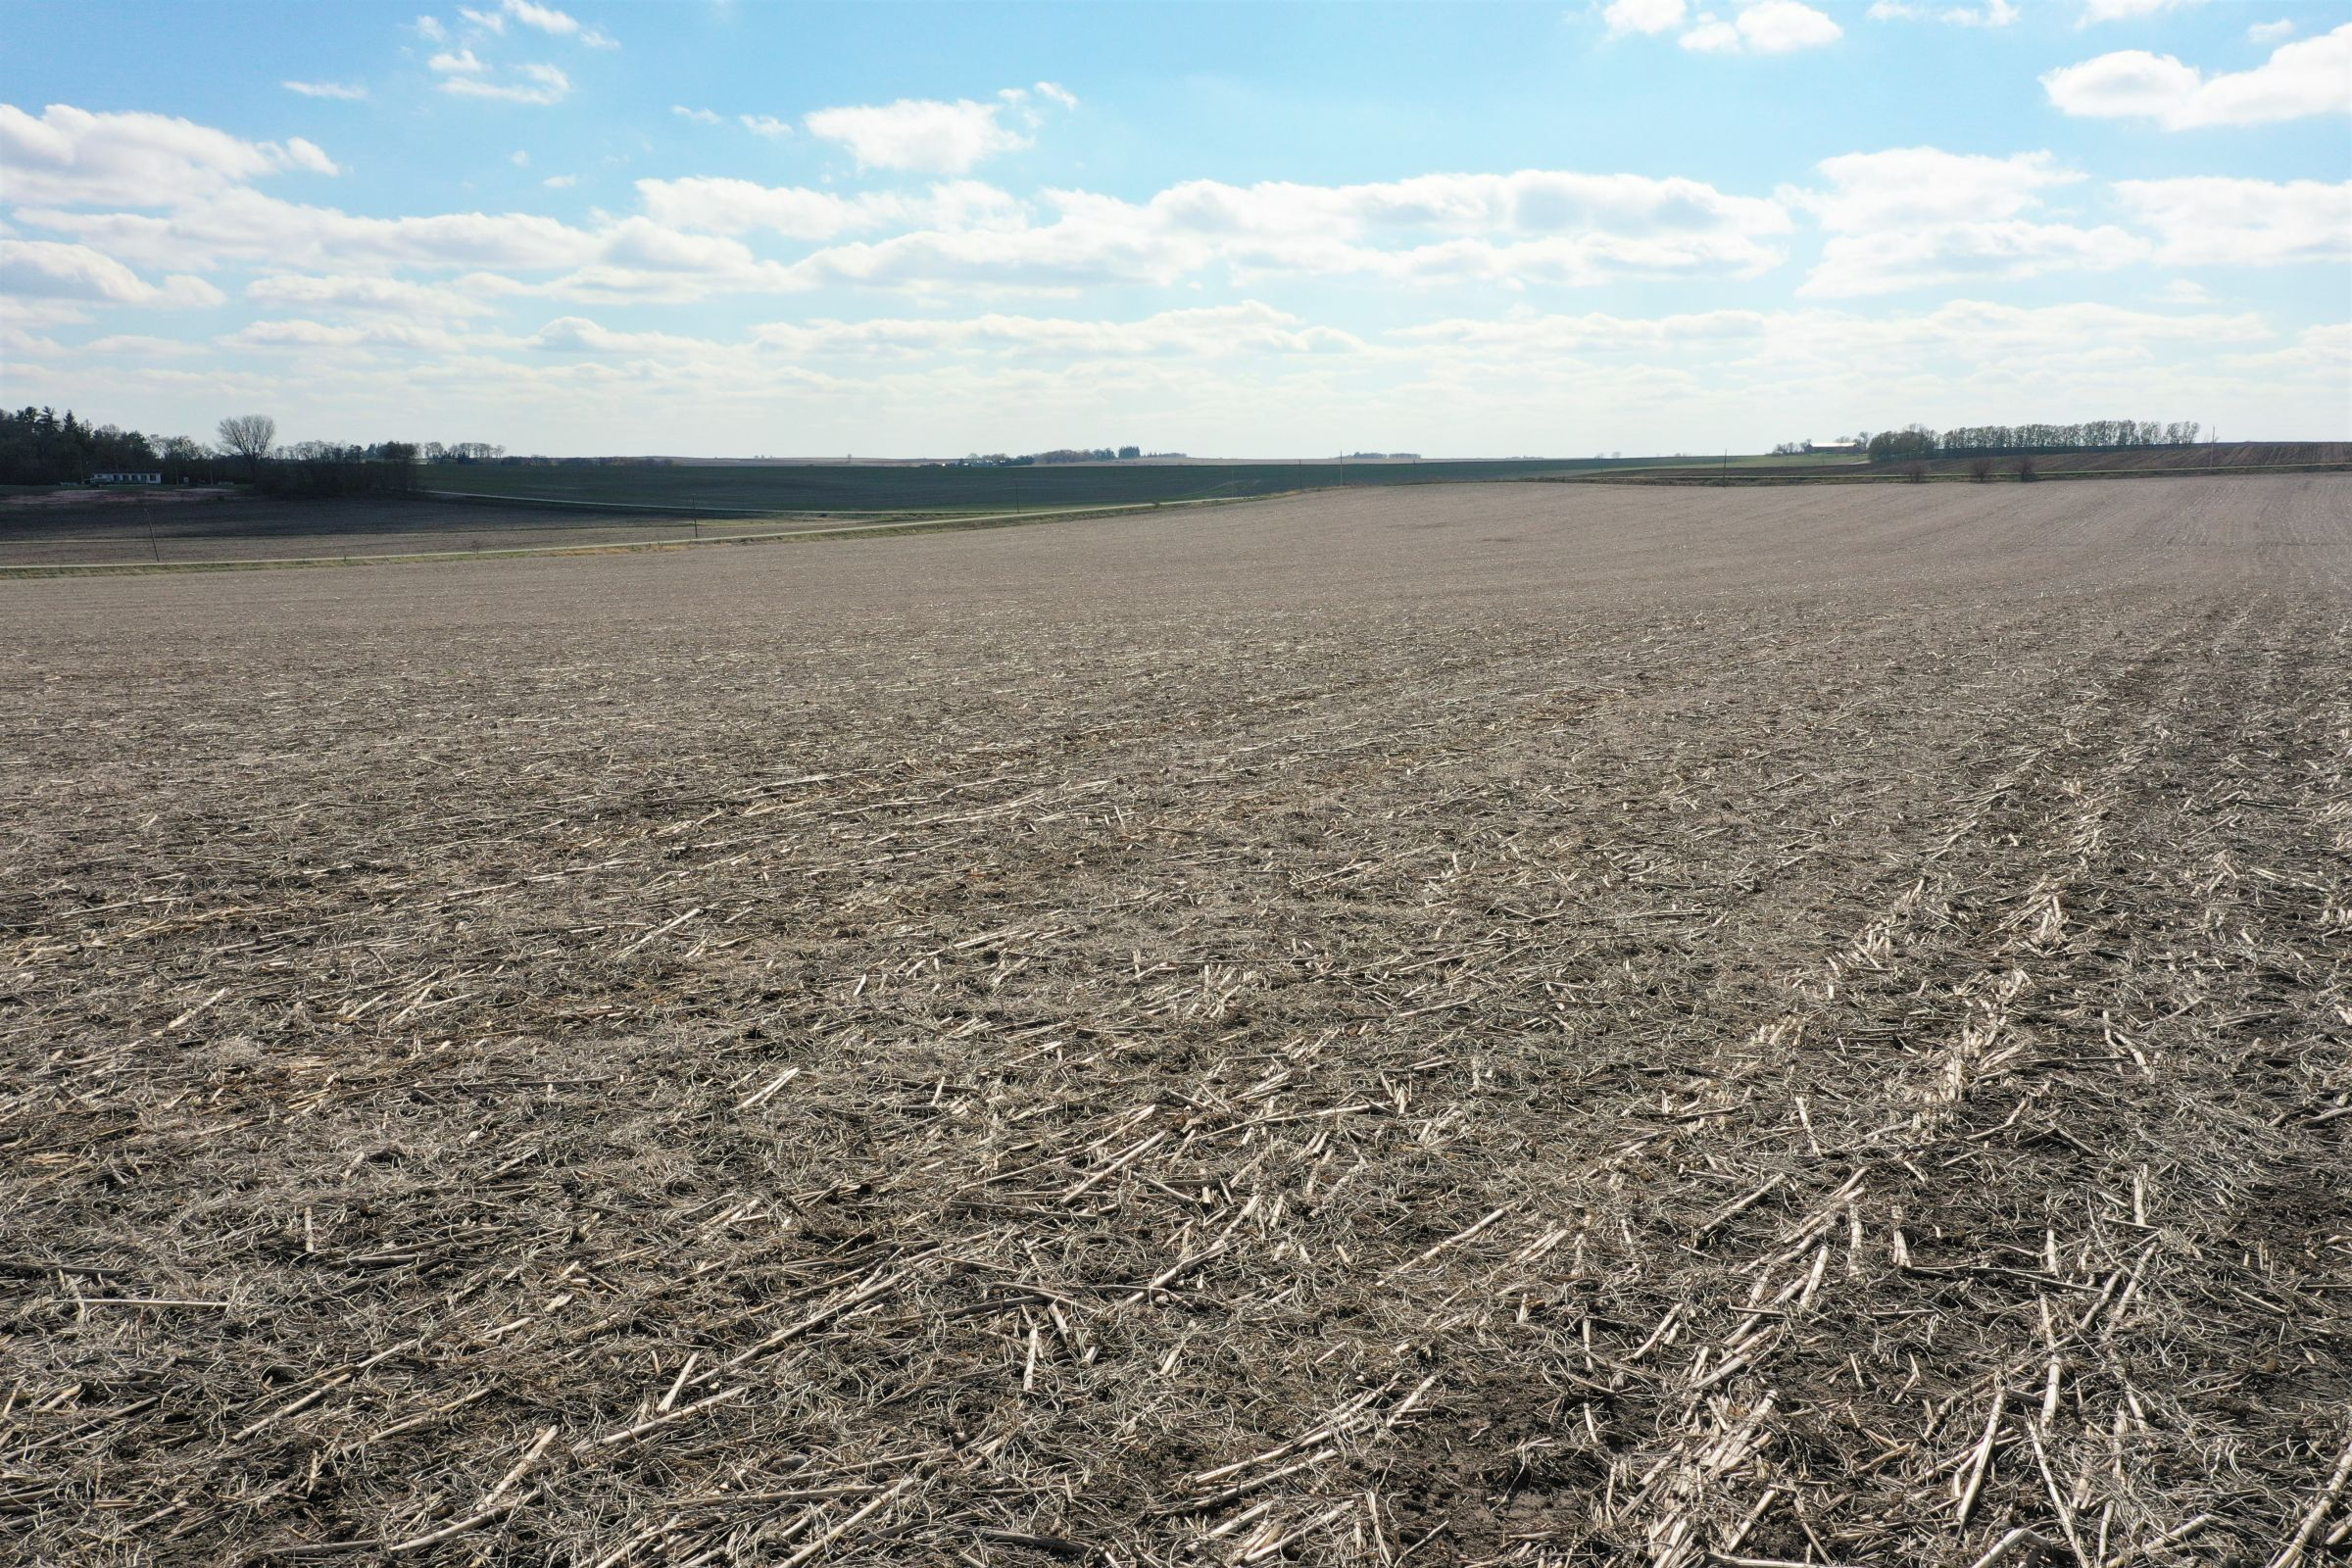 floyd-county-iowa-80-acres-listing-number-15486-2-2021-04-26-003052.JPG